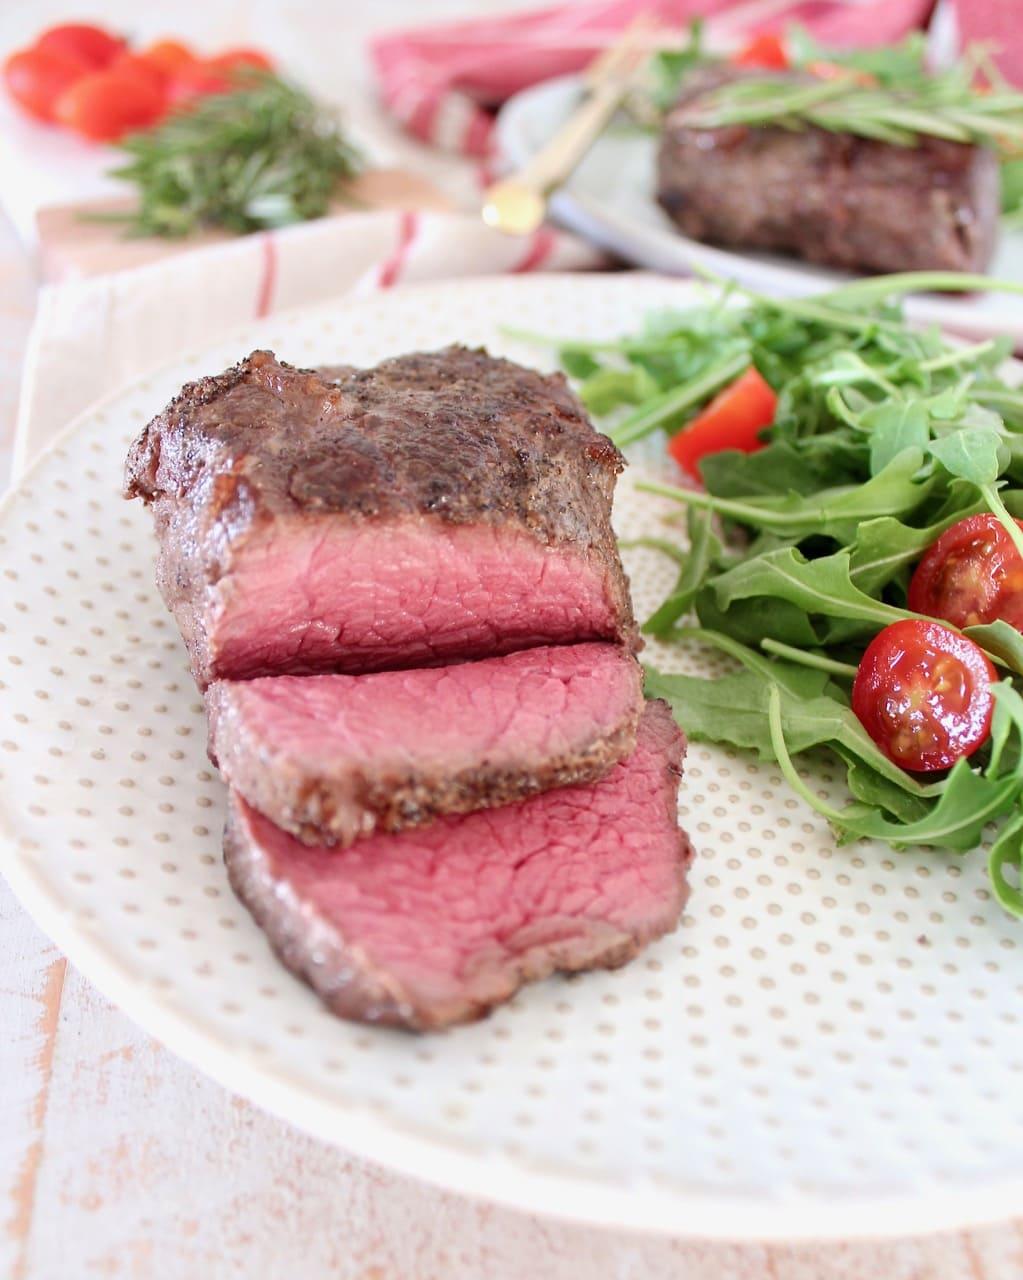 Medium Rare Sous Vide Top Sirloin Steak